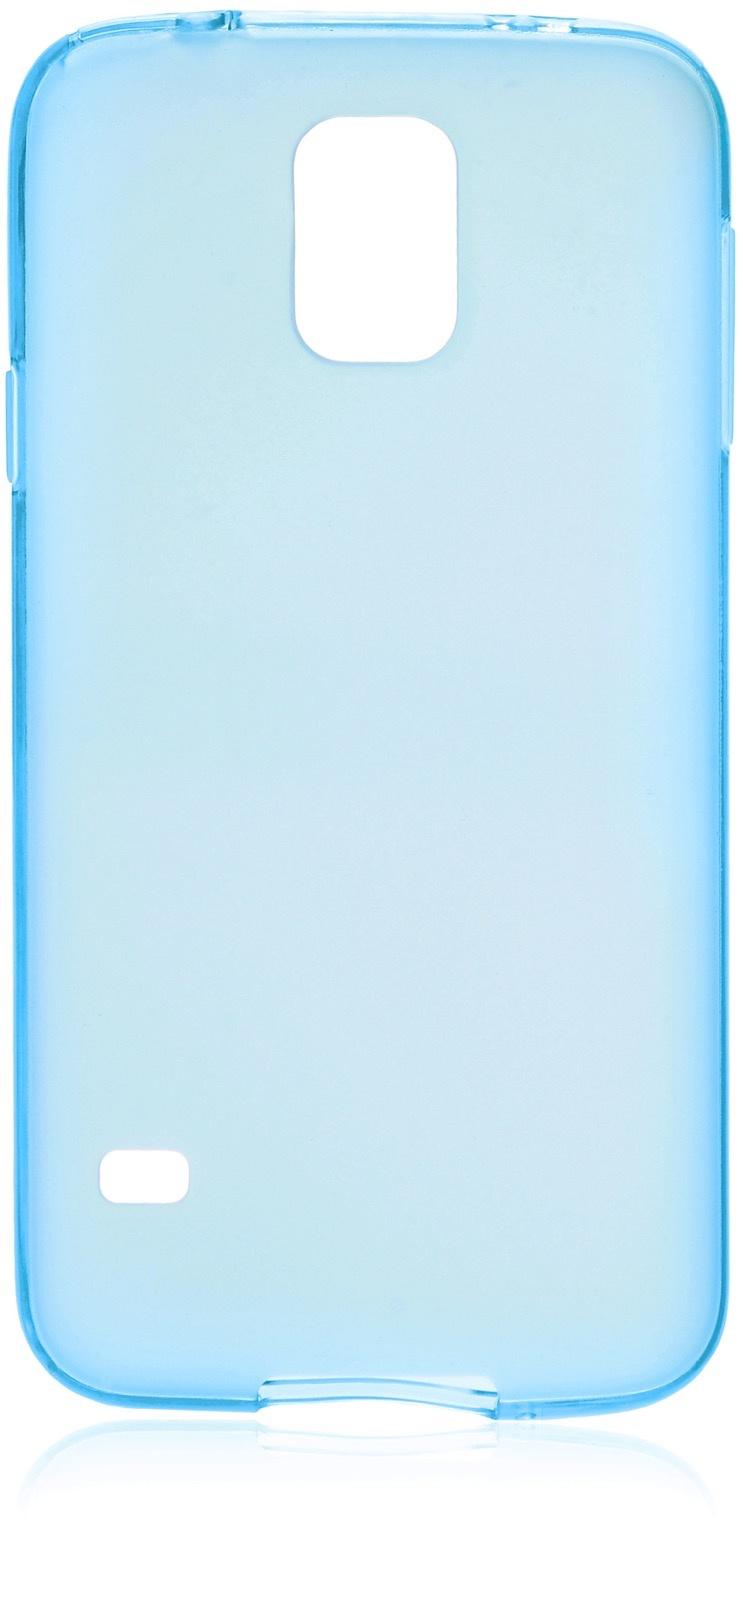 Чехол накладка iNeez силикон матовый 530043 для Samsung Galaxy S5,530043,синий